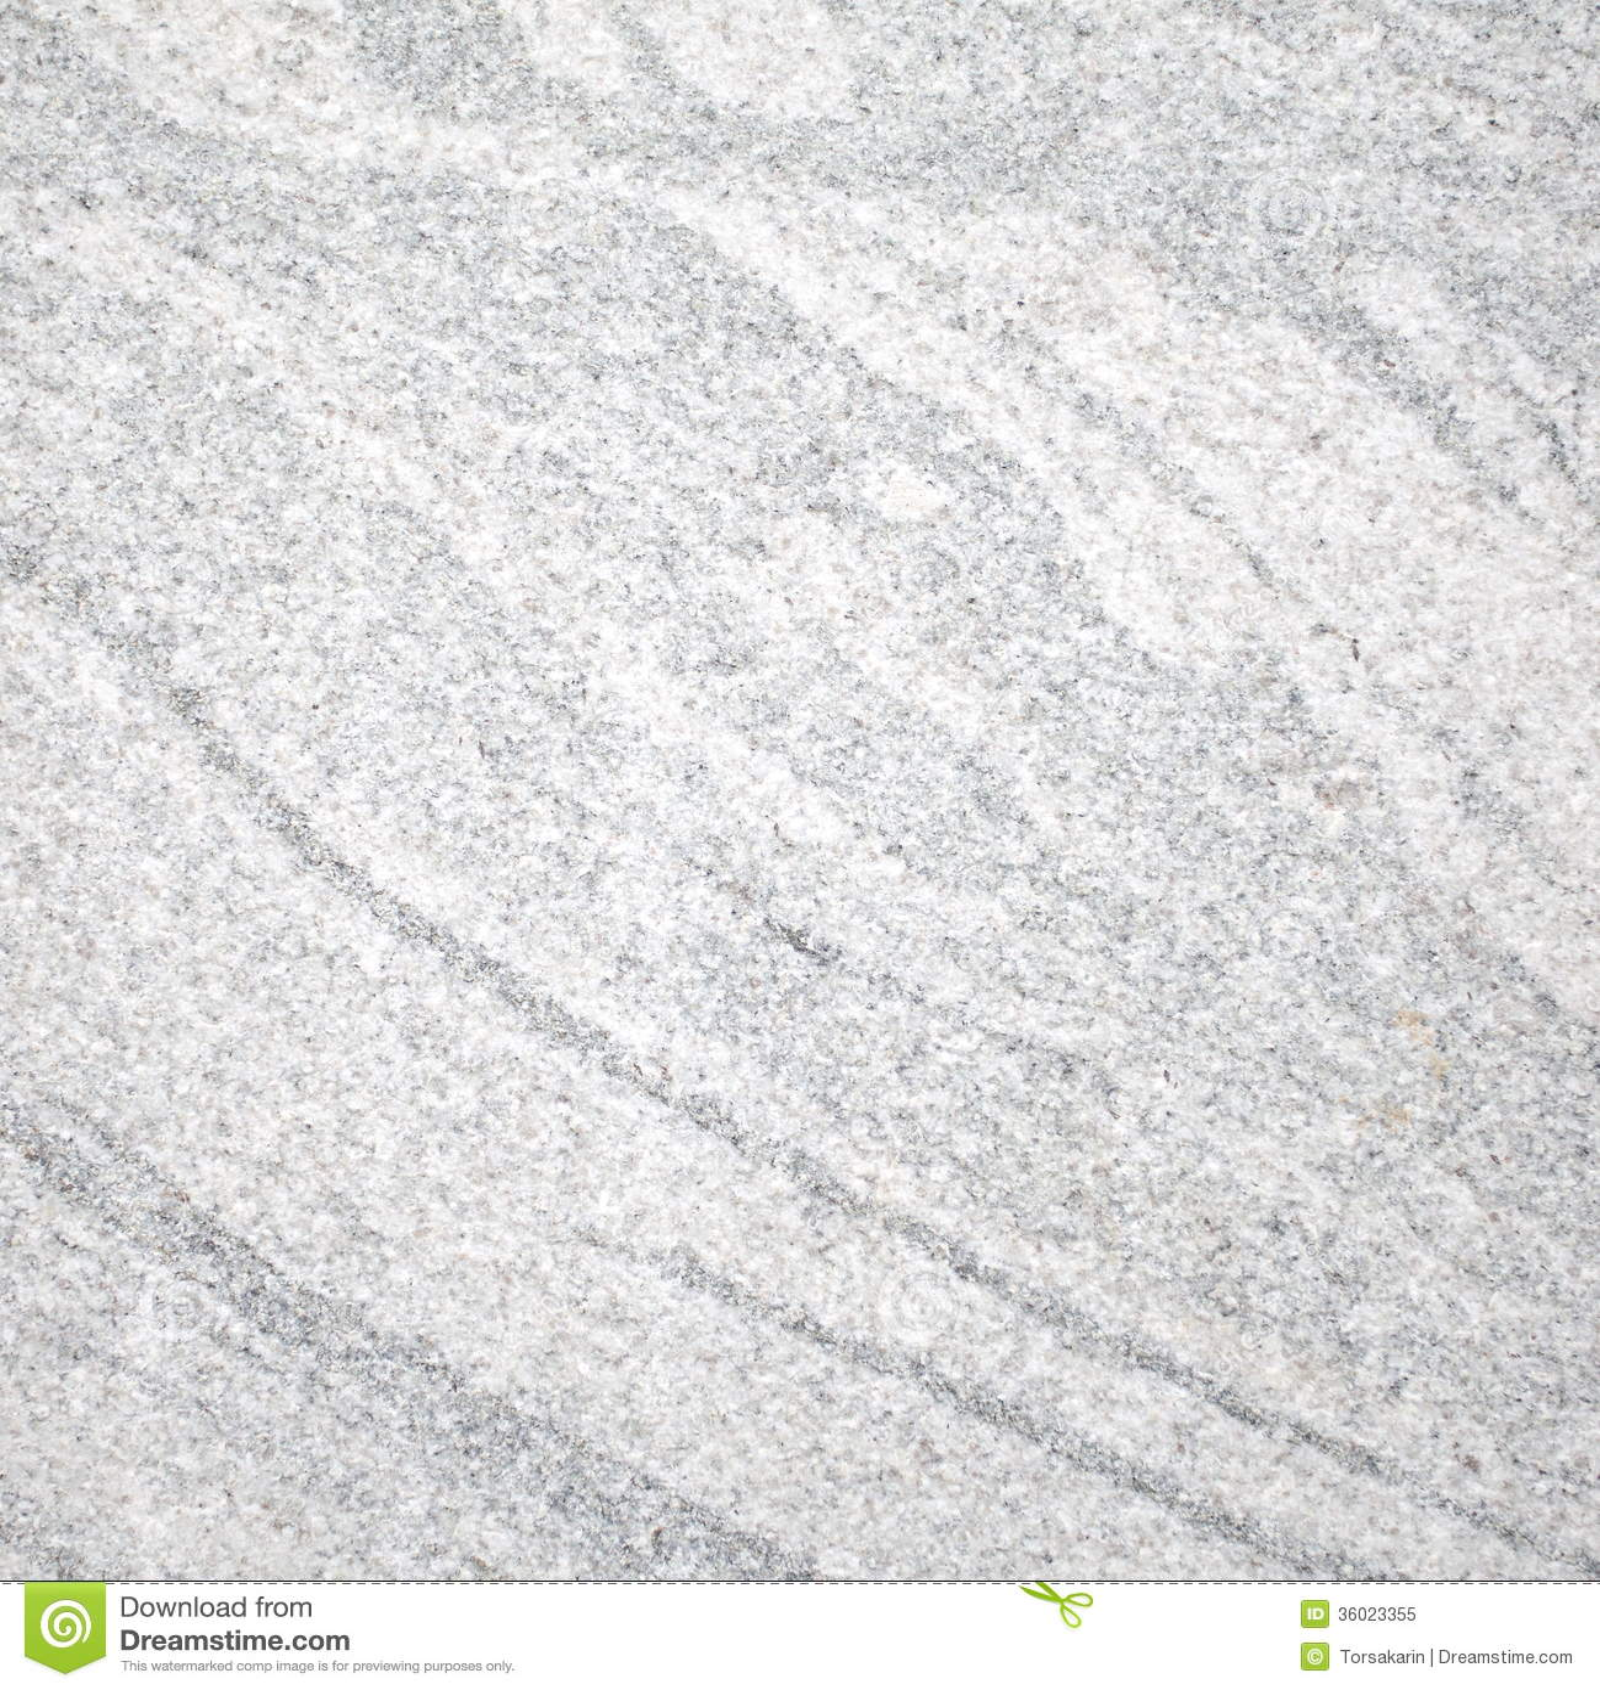 White Granite Background : White granite background stock image of geology